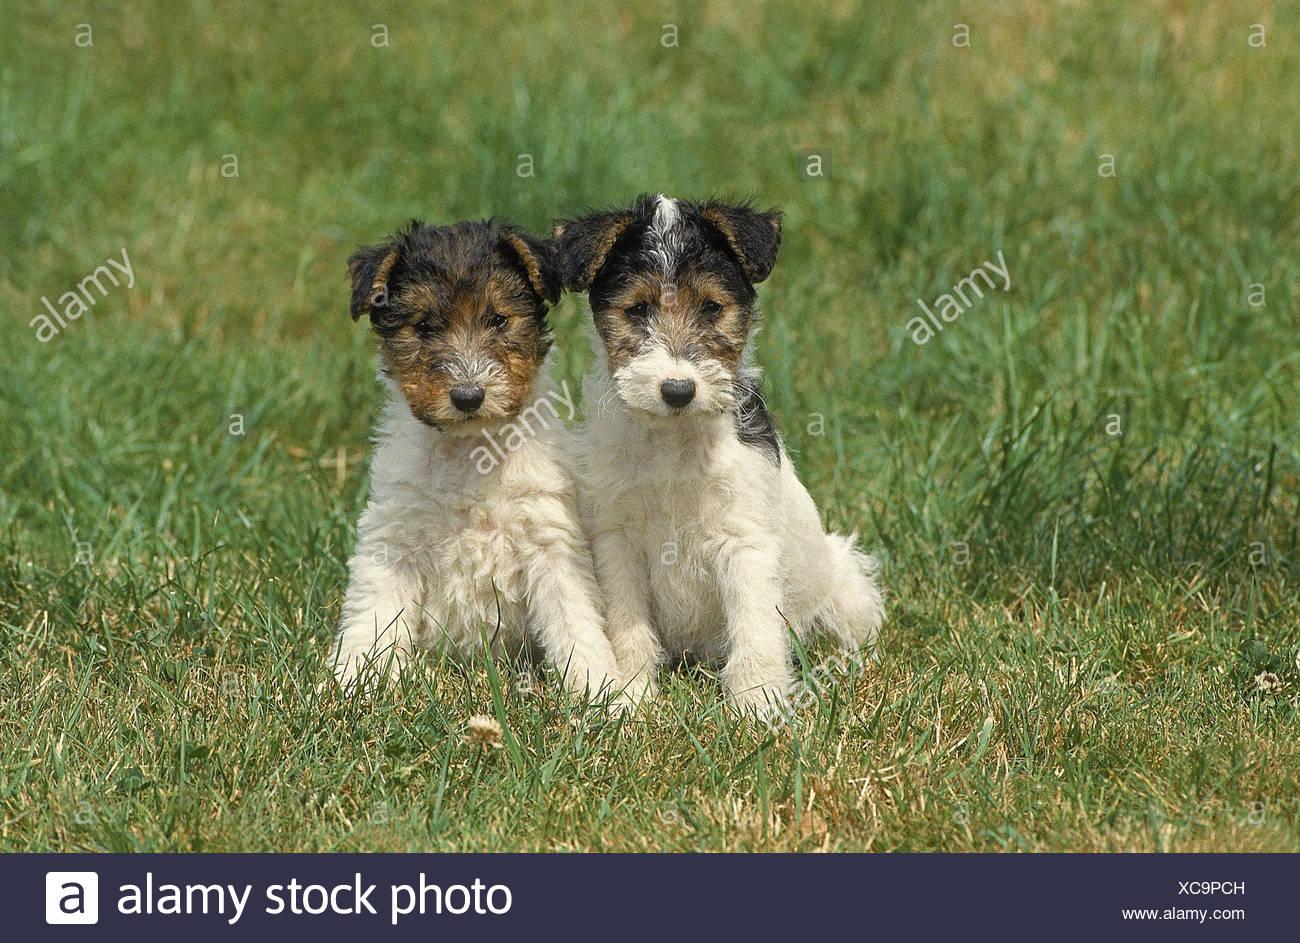 Hund Welpen, Drahthaar Terrier, zwei, Rasen, Sit Stockfoto, Bild ...